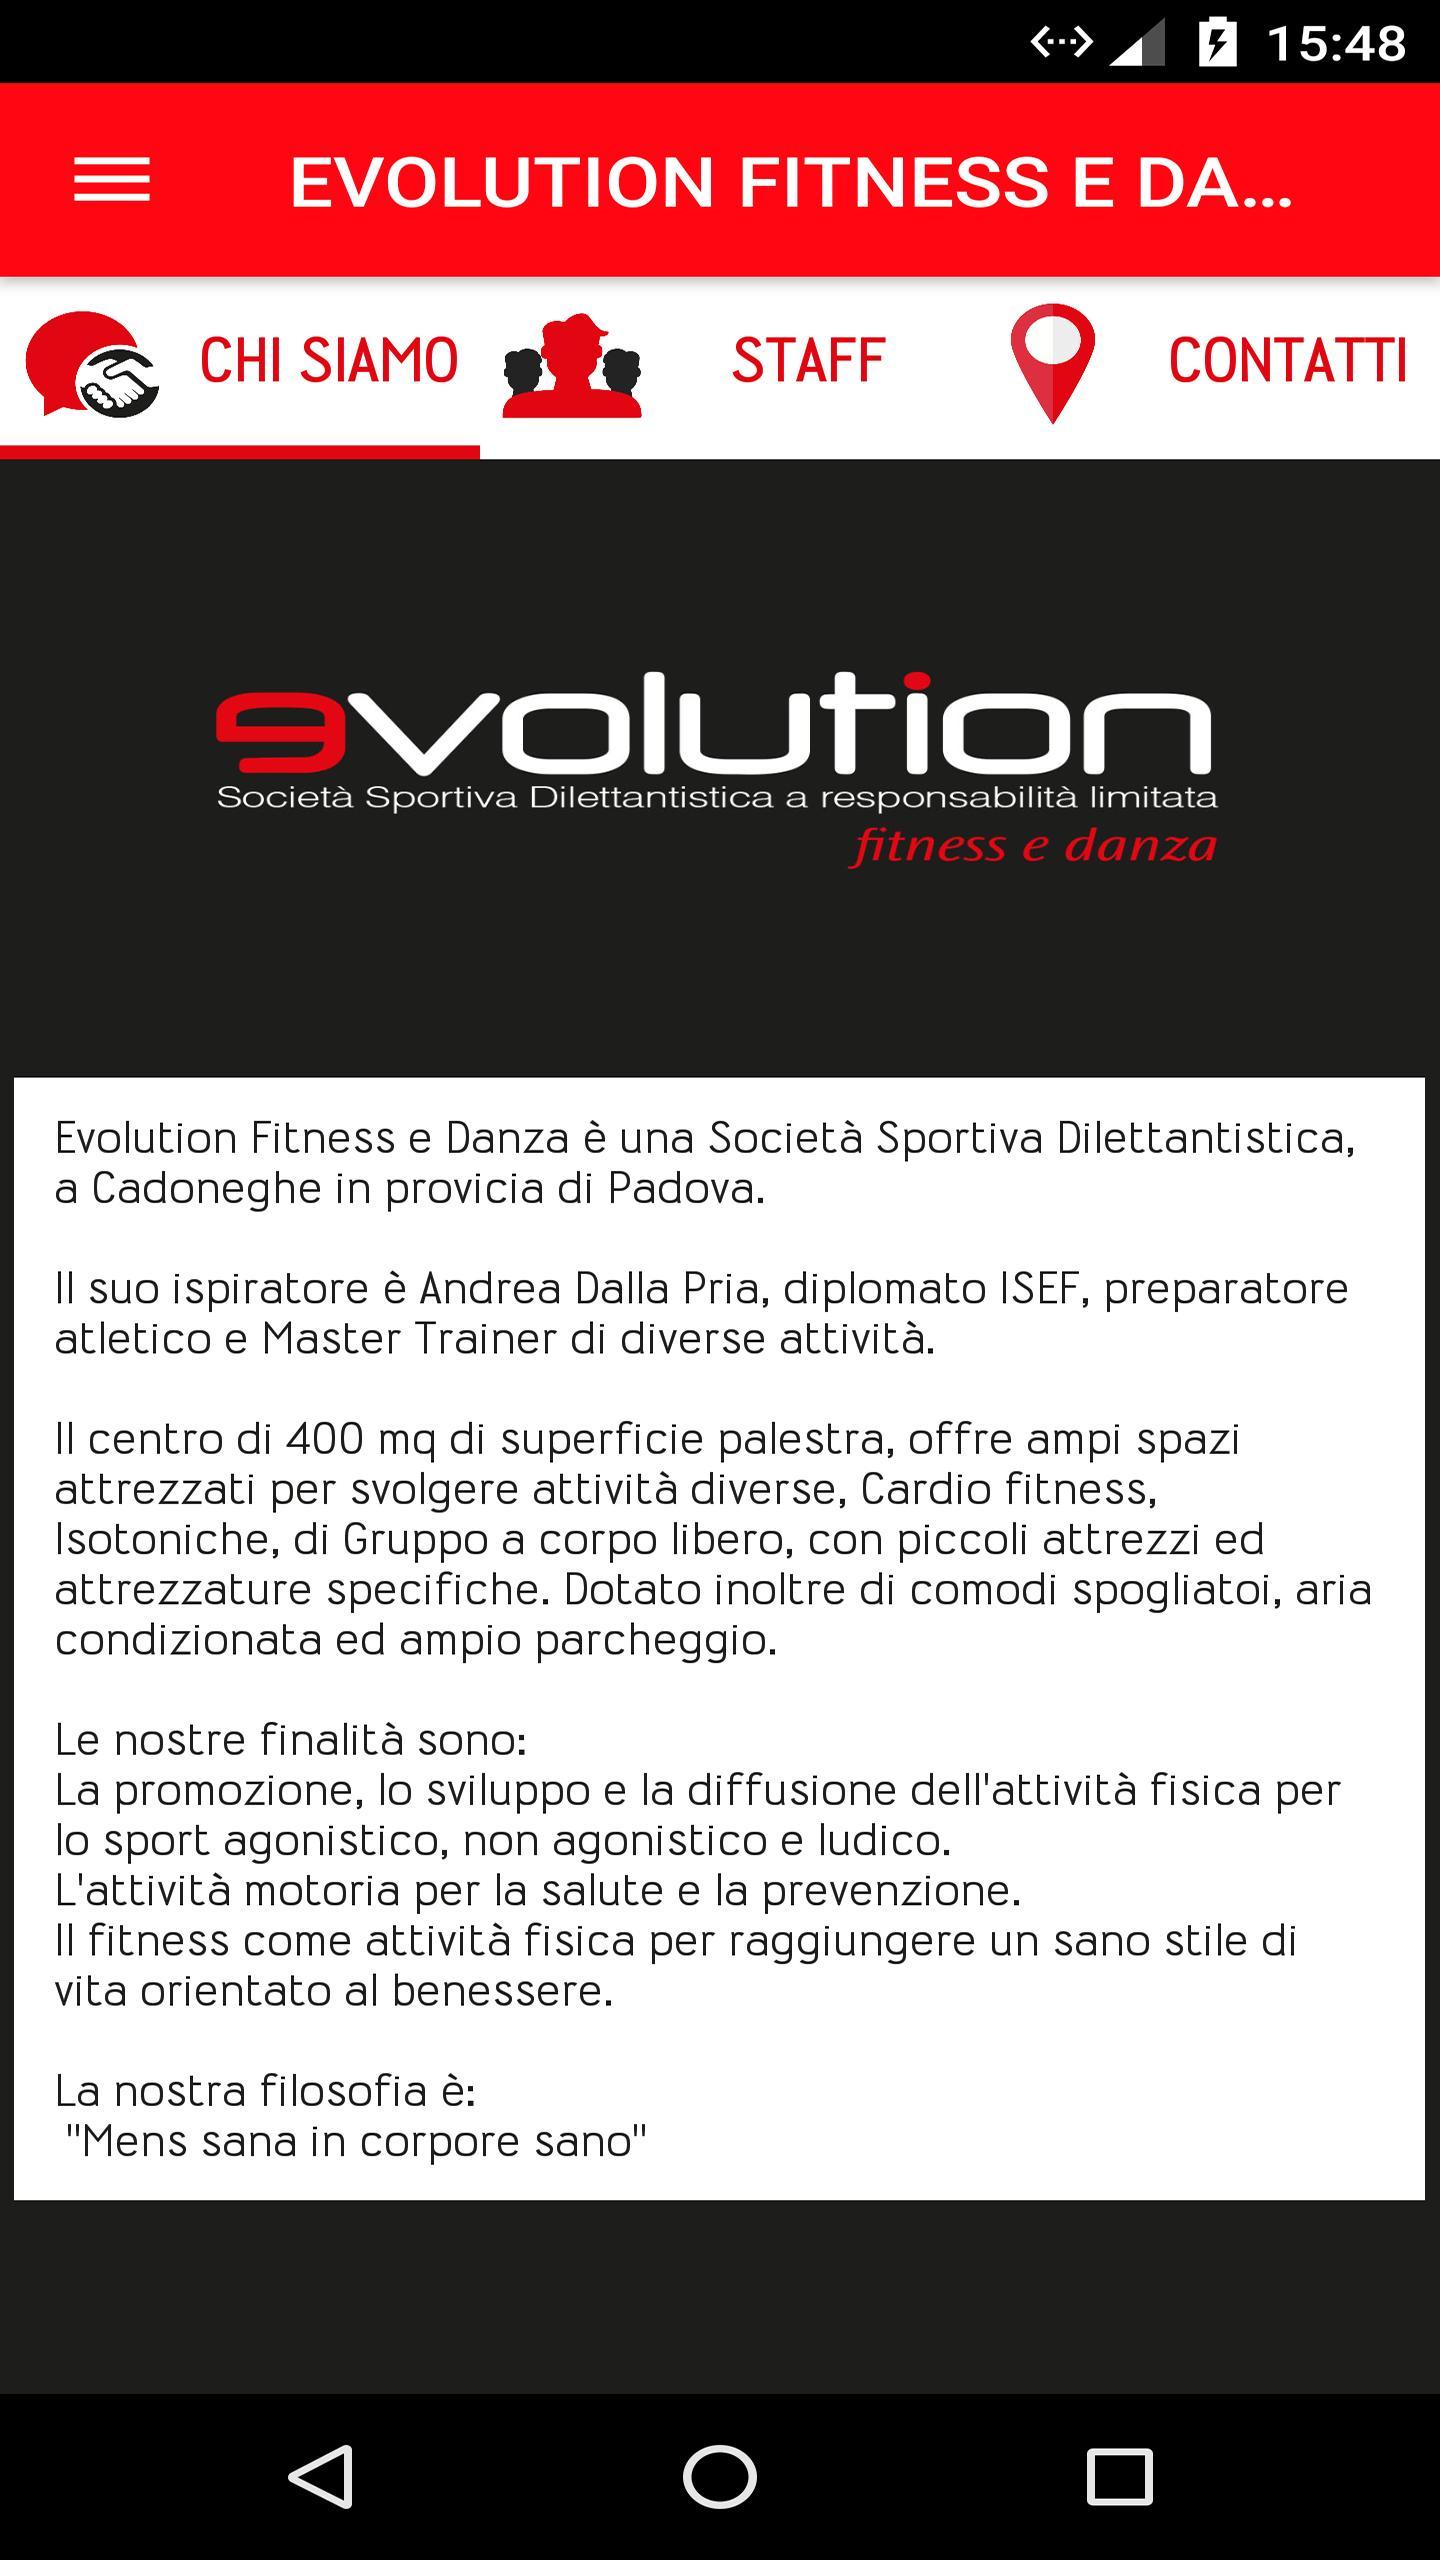 Evolution Fitness E Danza For Android Apk Download